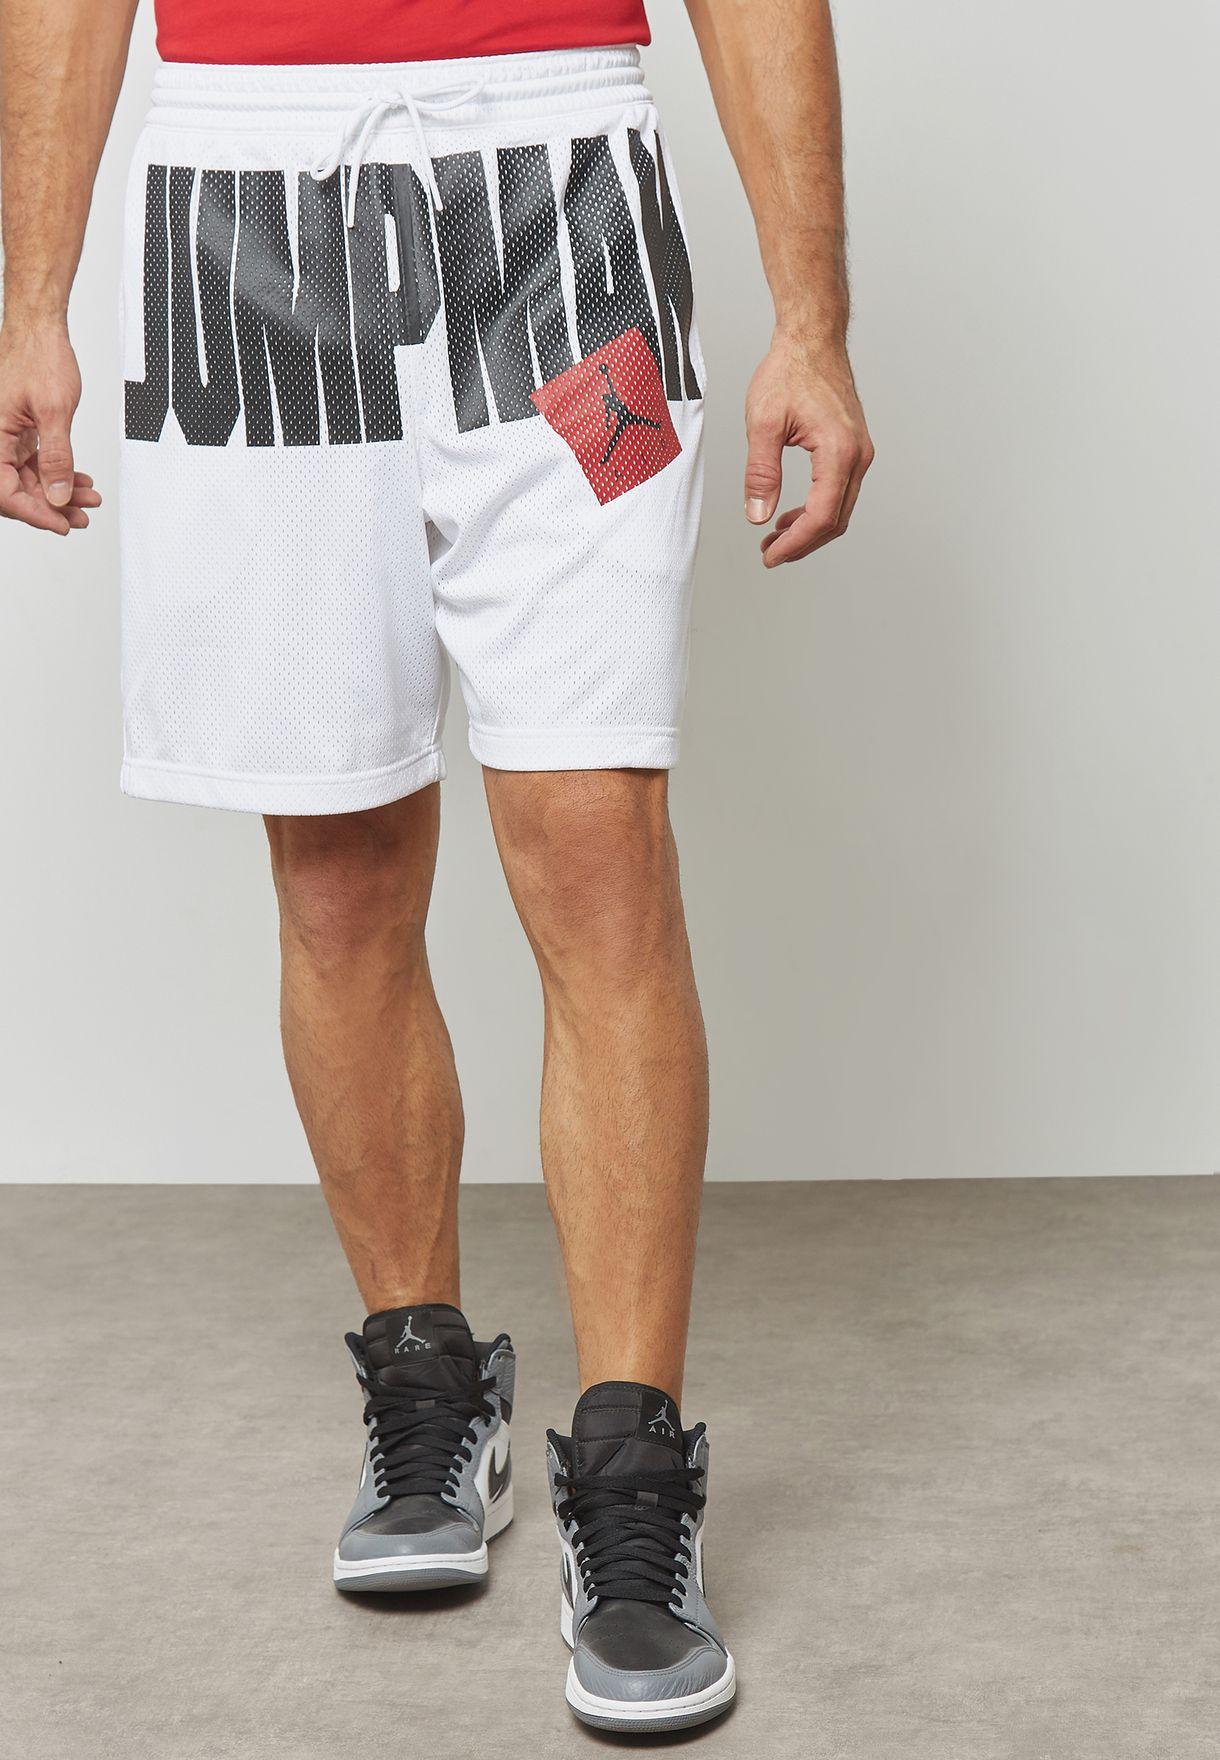 Hola defecto perder  Buy Nike white Jordan Jumpman Air Mesh Shorts for Men in MENA, Worldwide |  AA4607-100